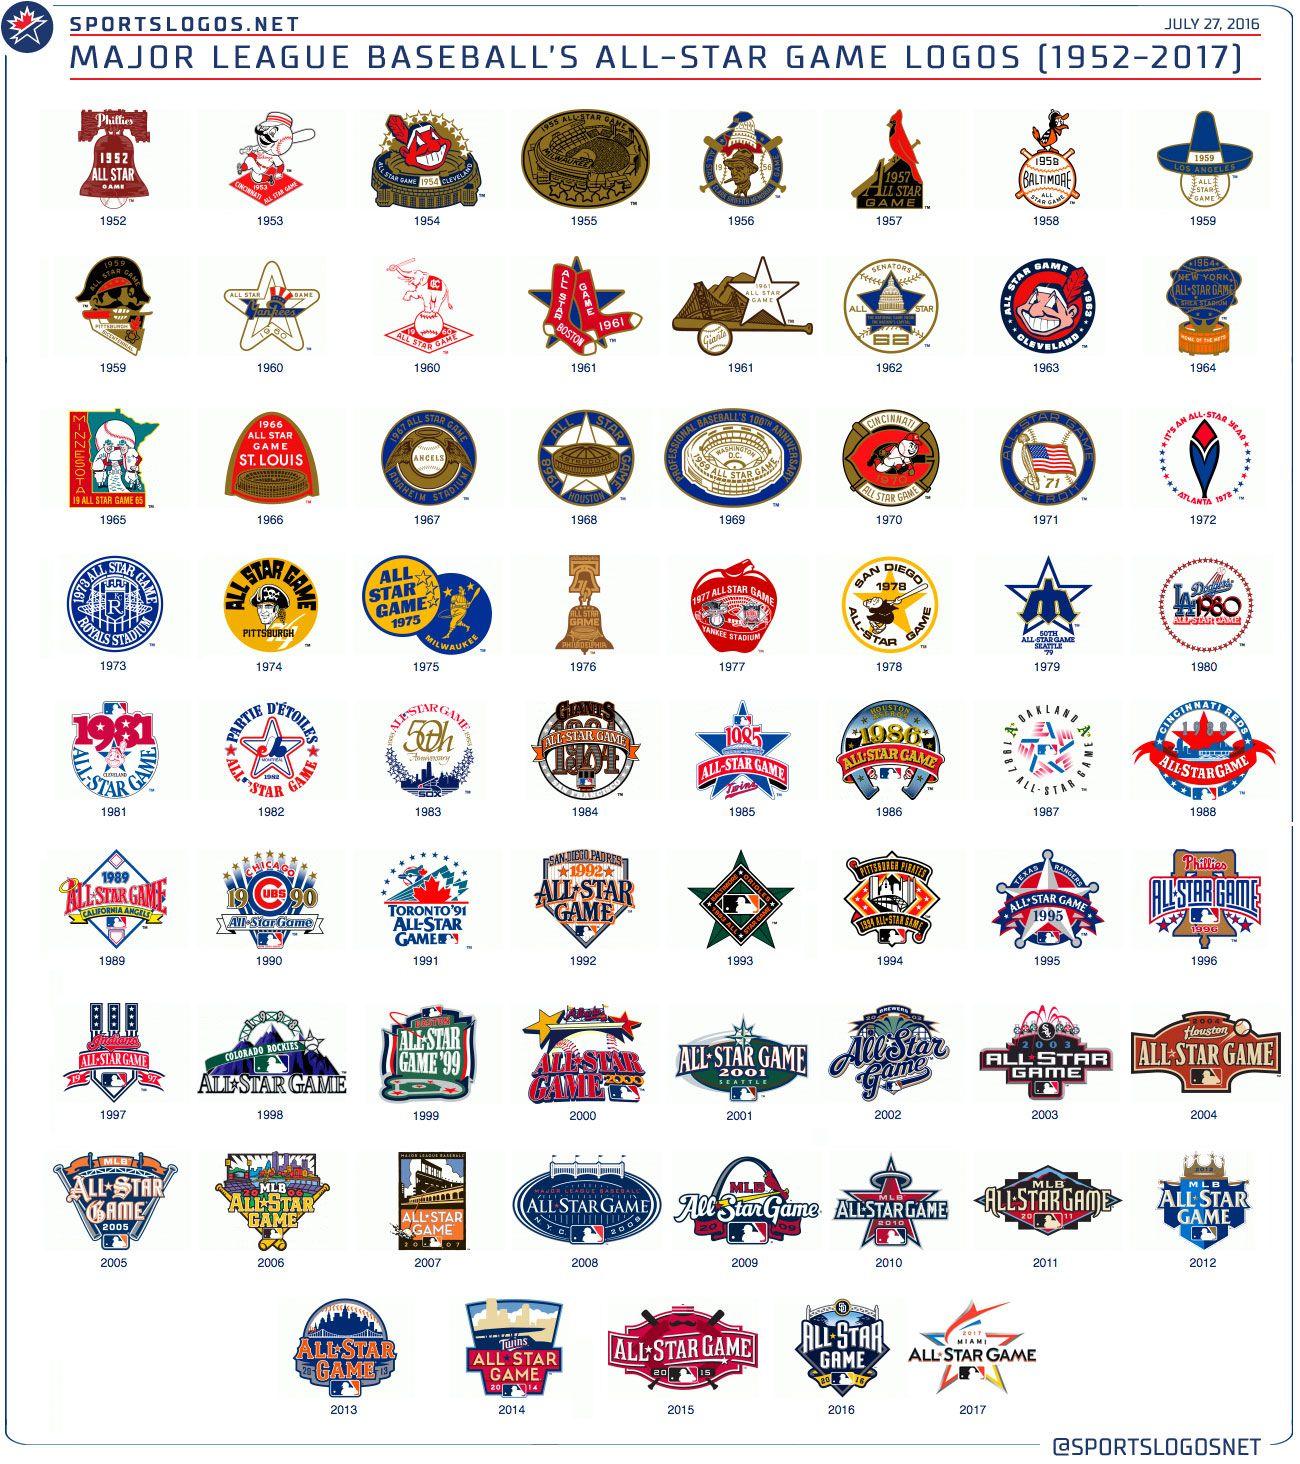 Sleek Modern Logo For 2017 Mlb All Star Game In Miami Unveiled Major League Baseball Game Logo Baseball Savings